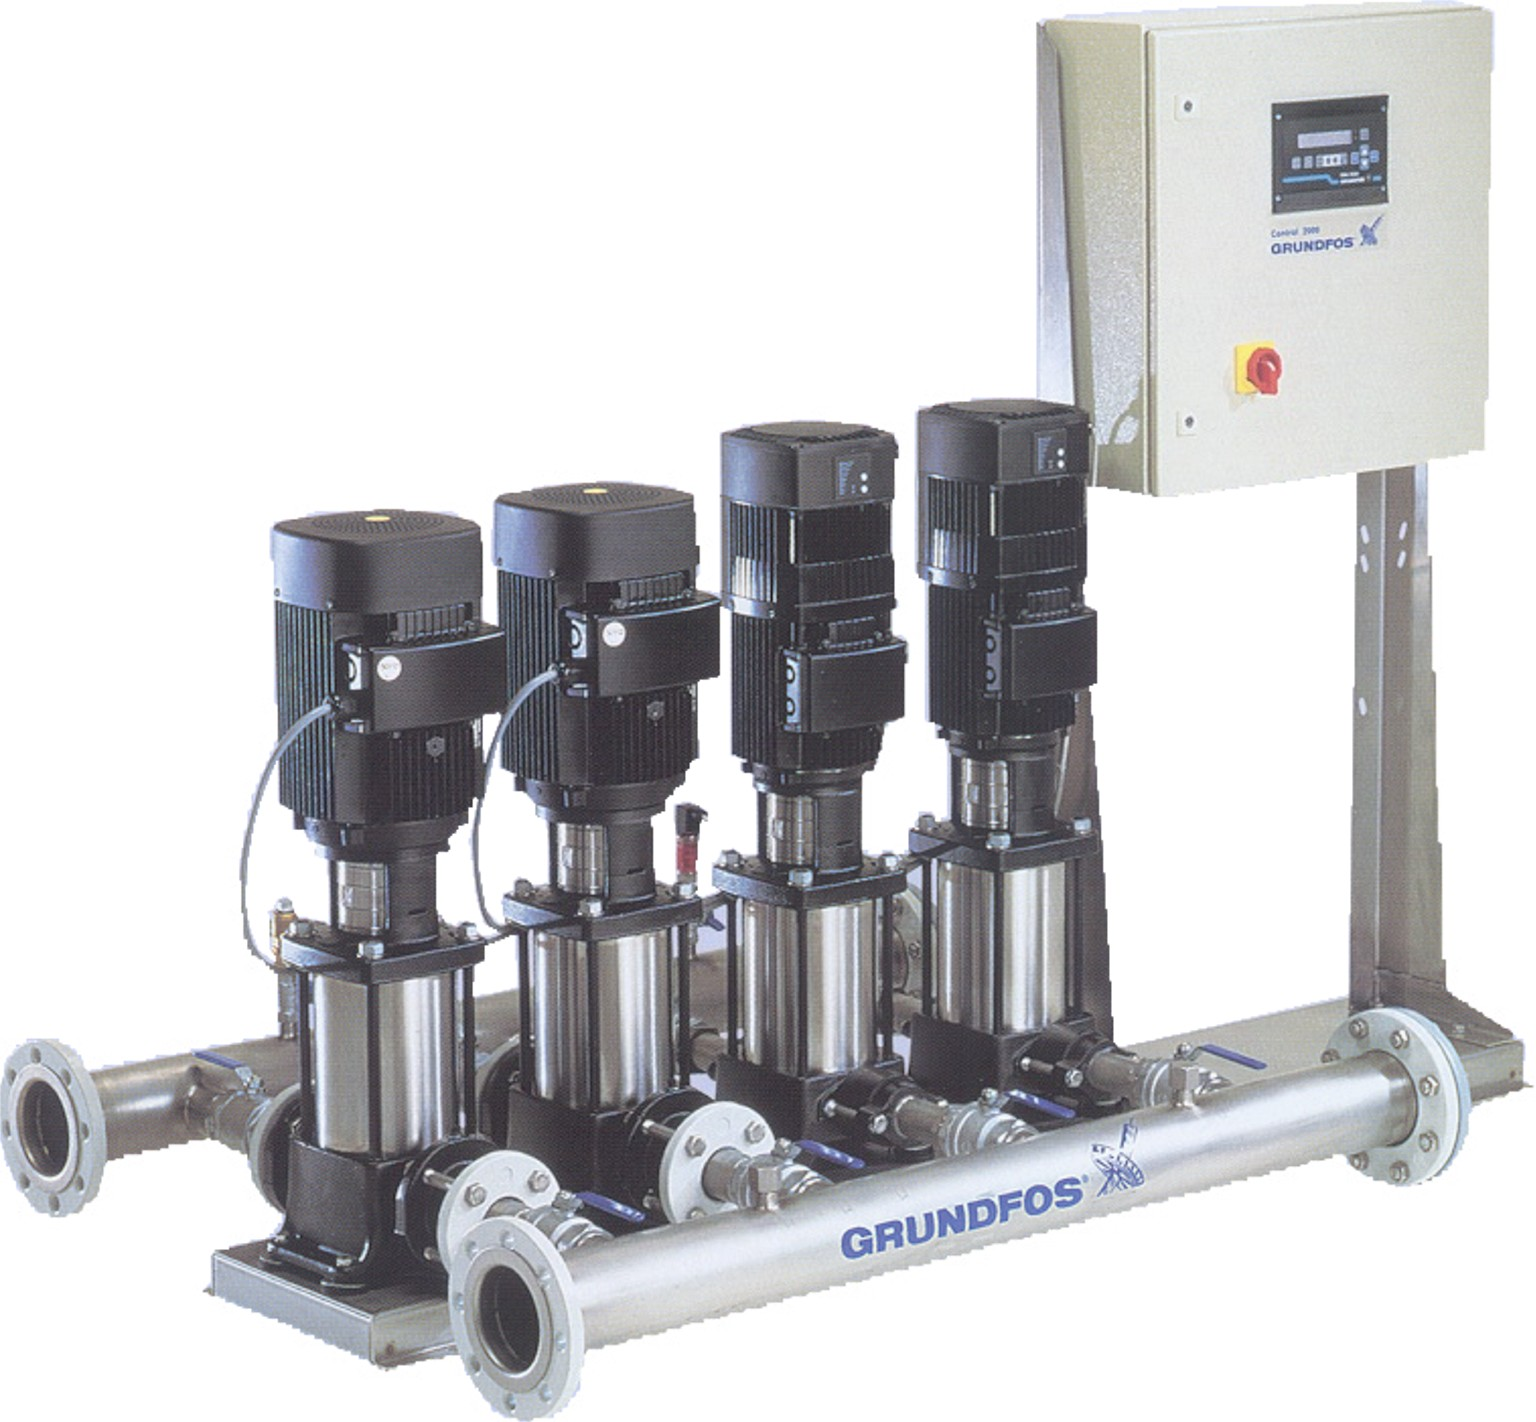 Grundfos Booster Pumps | Control Specialties